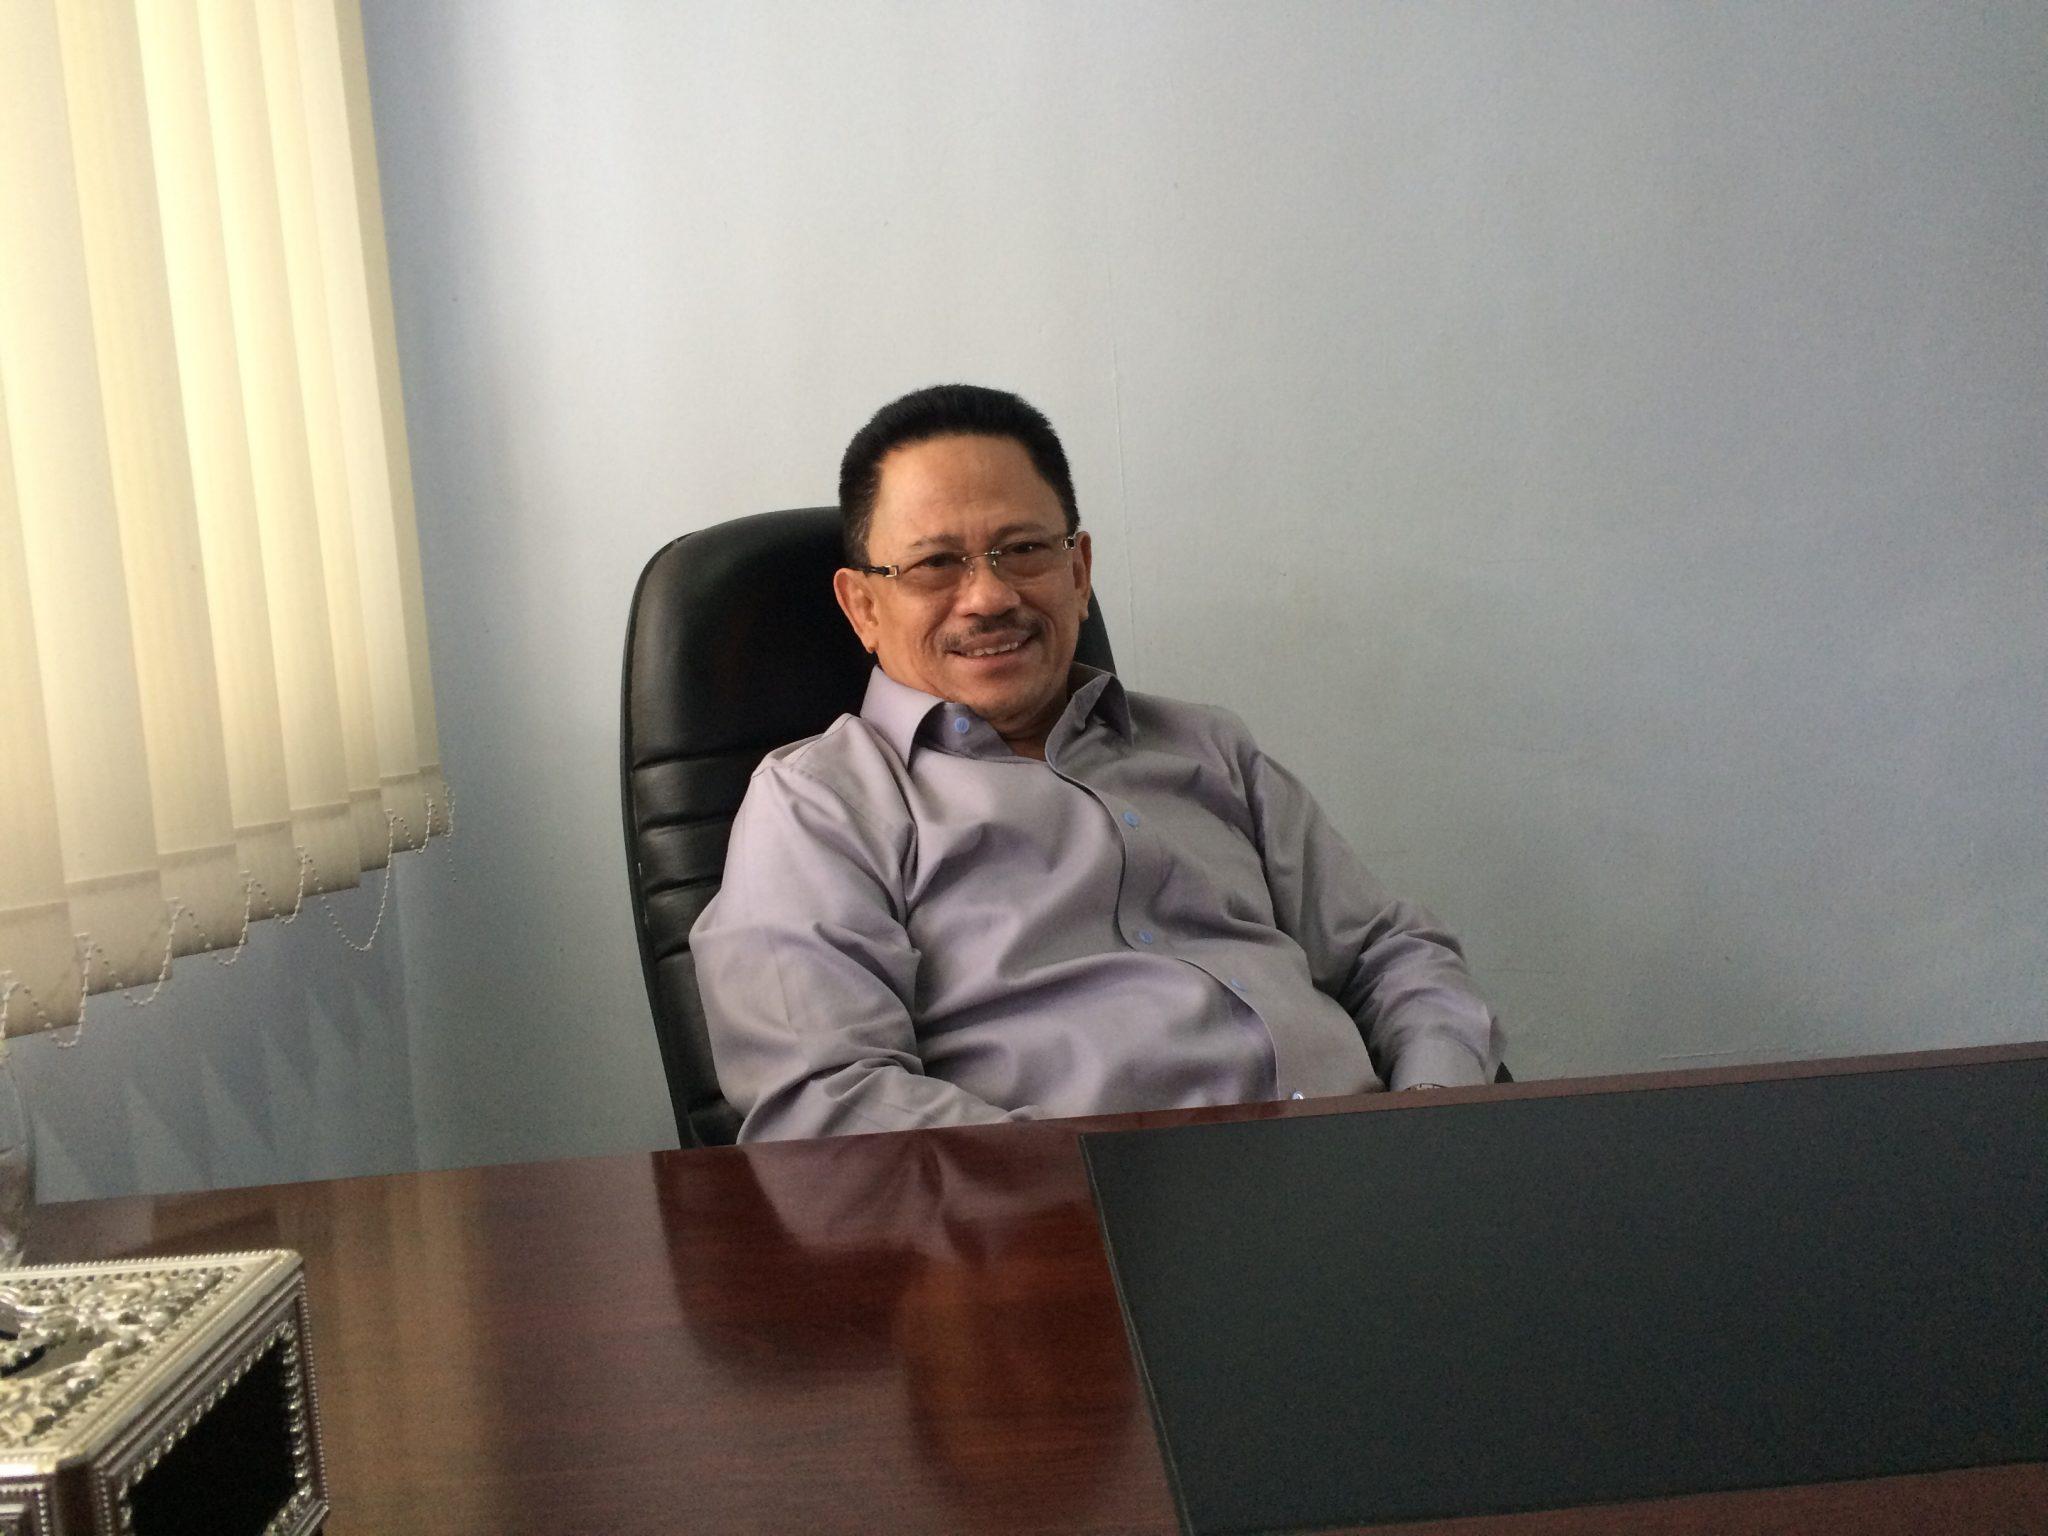 Gagal Maju di Pilwako, Djelantik Diminta ke DPR RI   Berita Politik